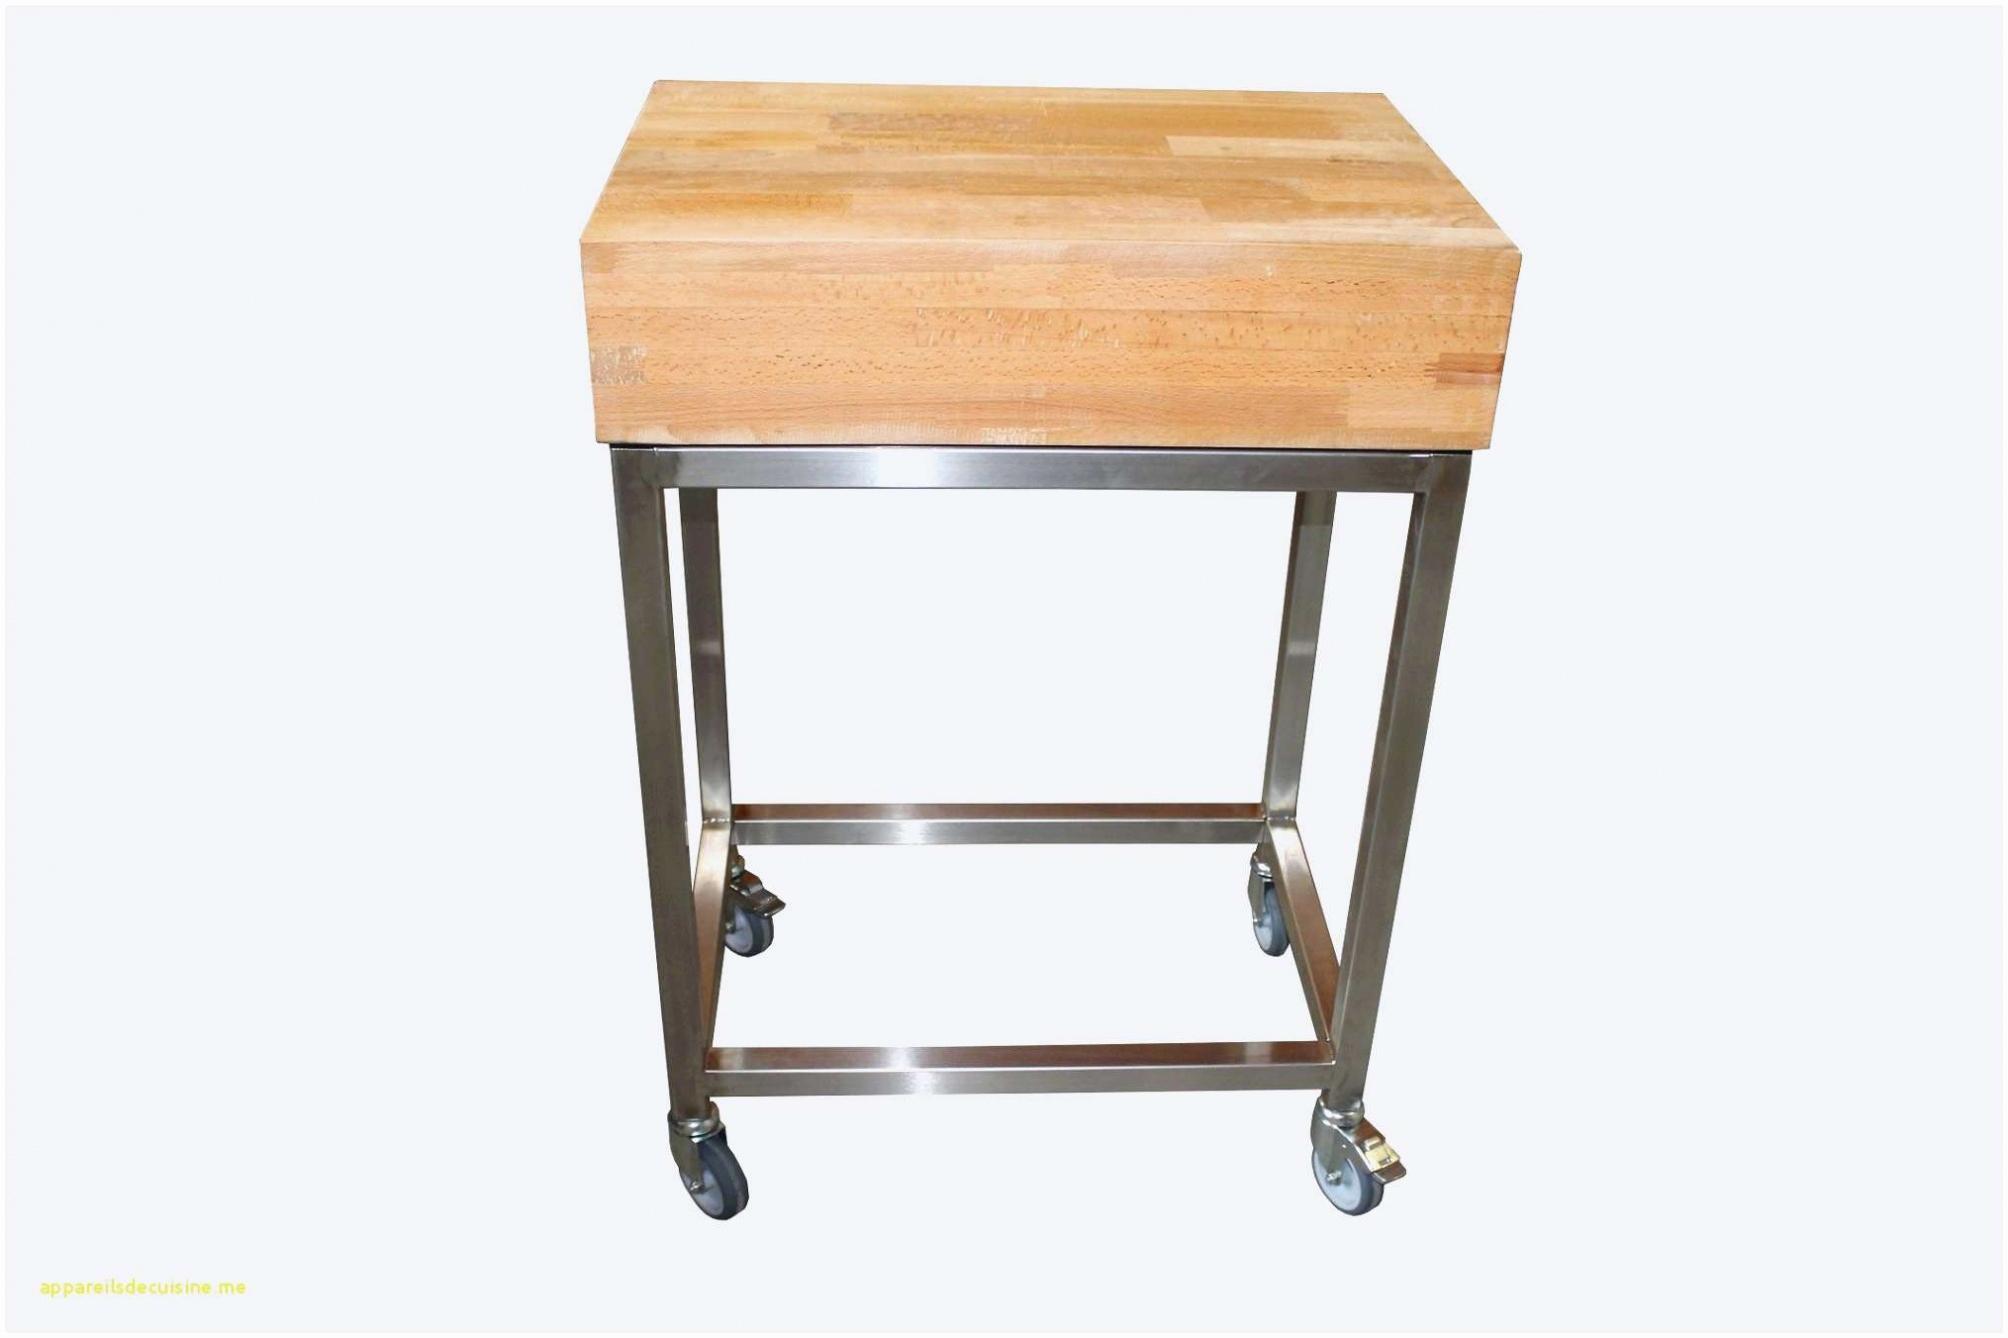 table jardin alinea beau 0d ilot archives central table alinea chaise beau haute but yf6mvib7gy of table jardin alinea